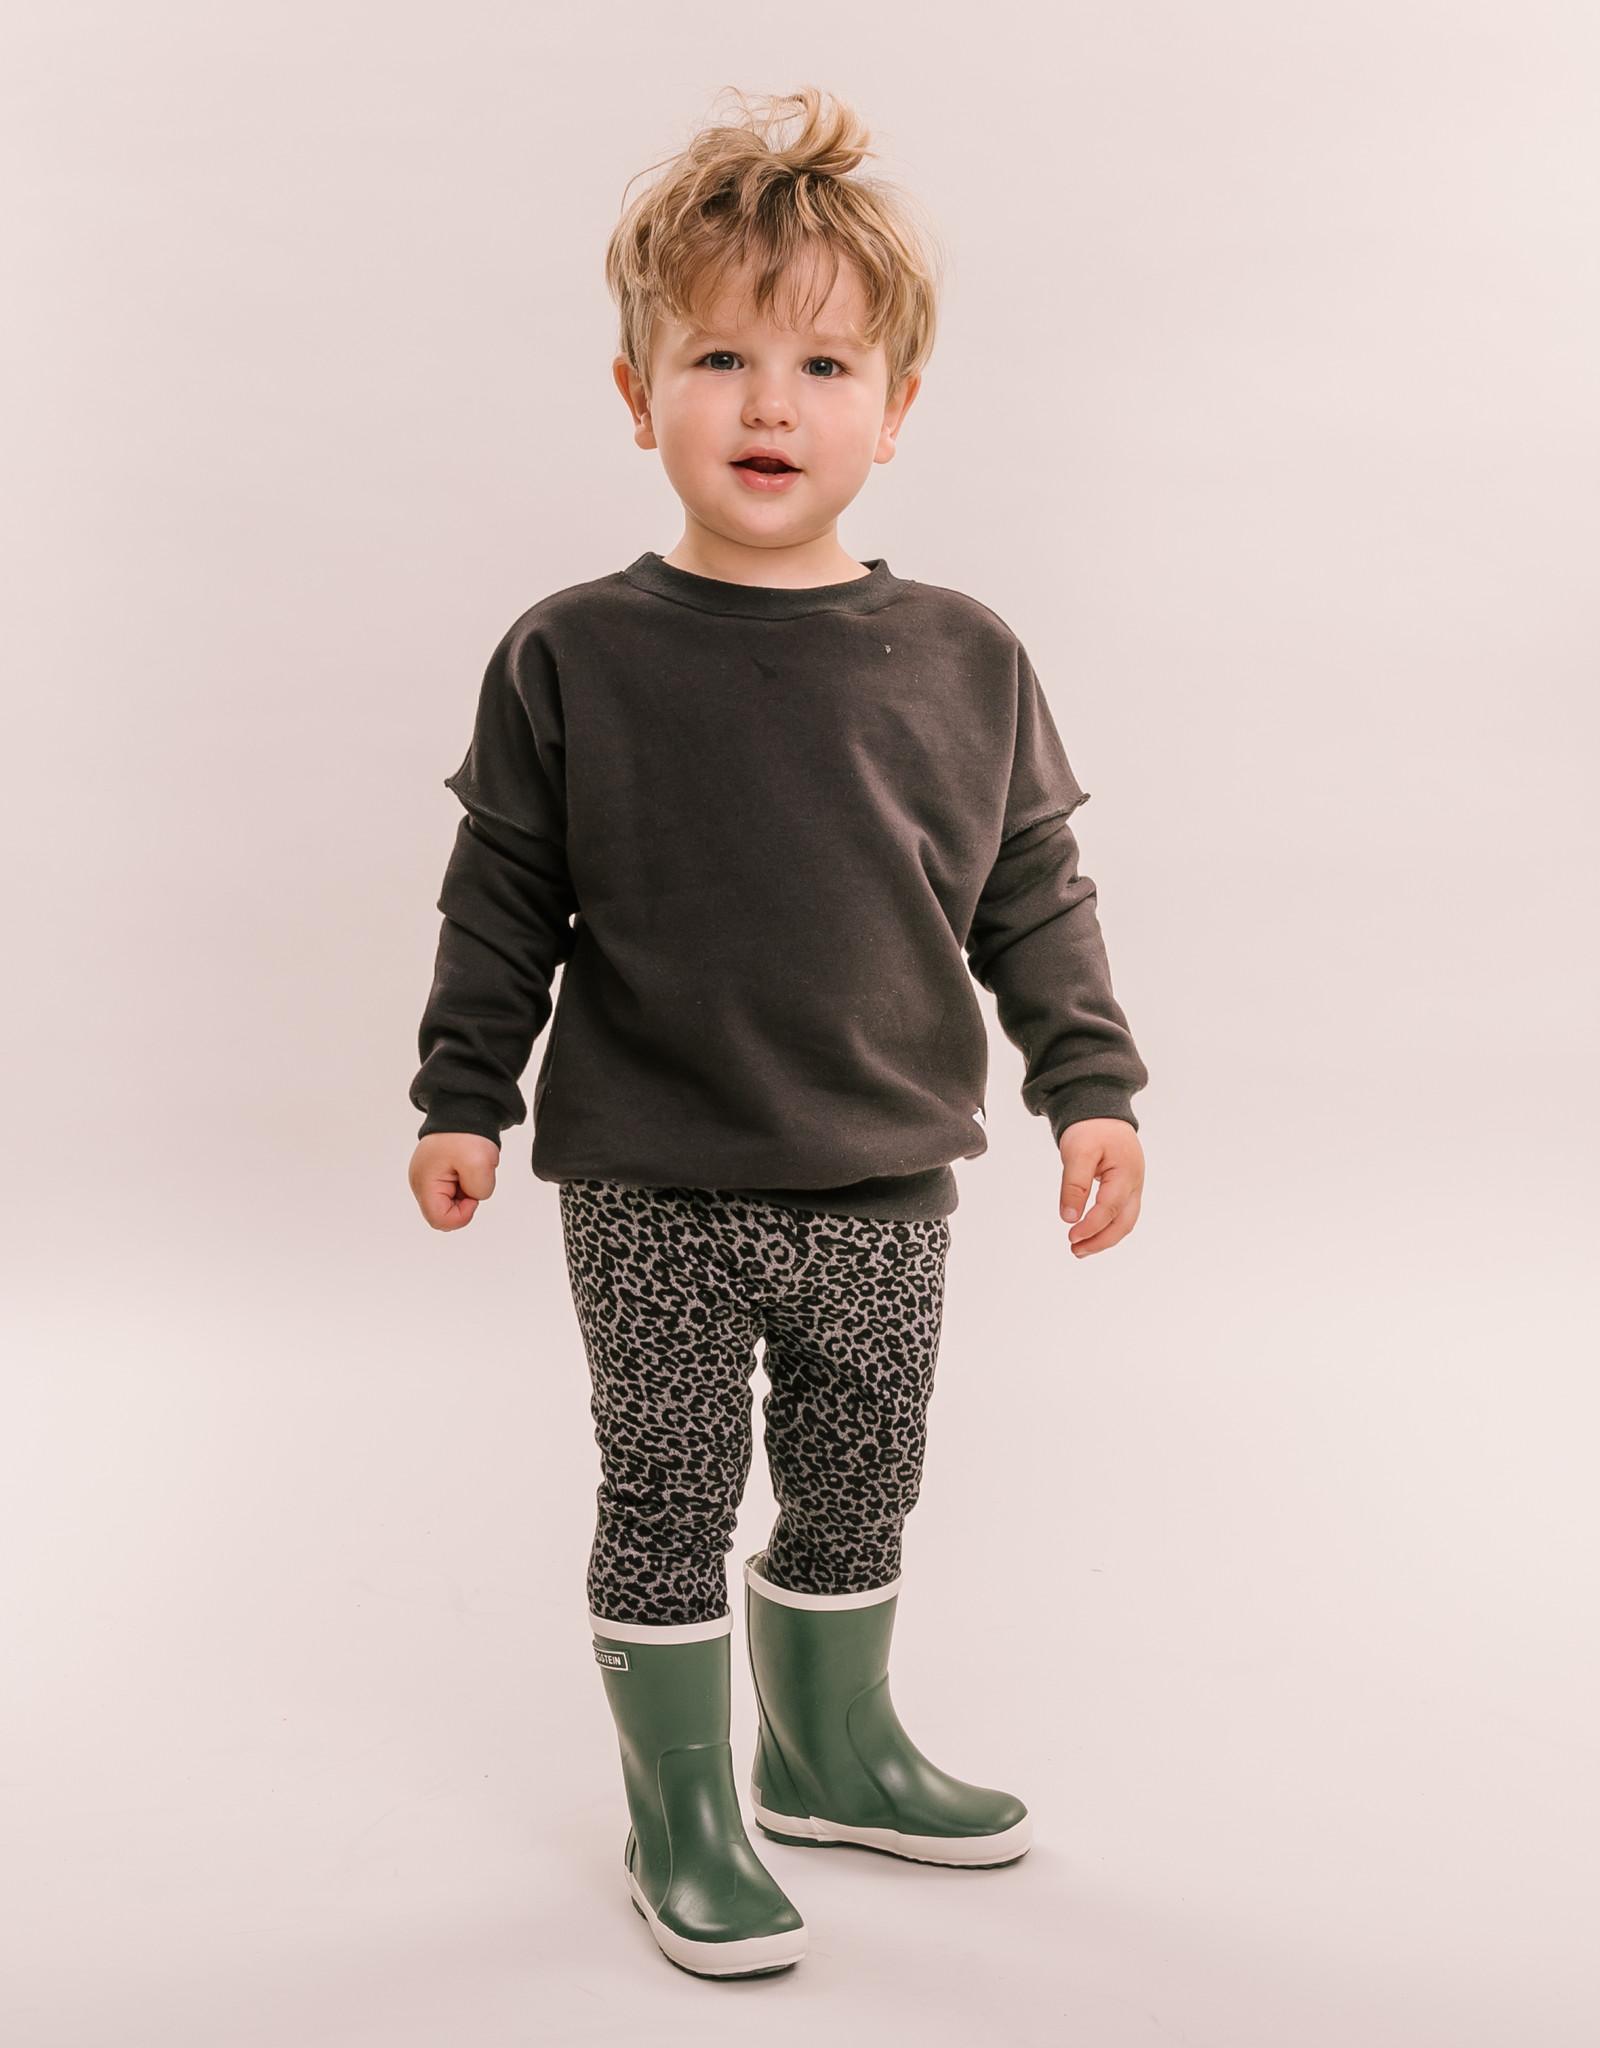 No Labels Kidswear Legging - Grey Leo